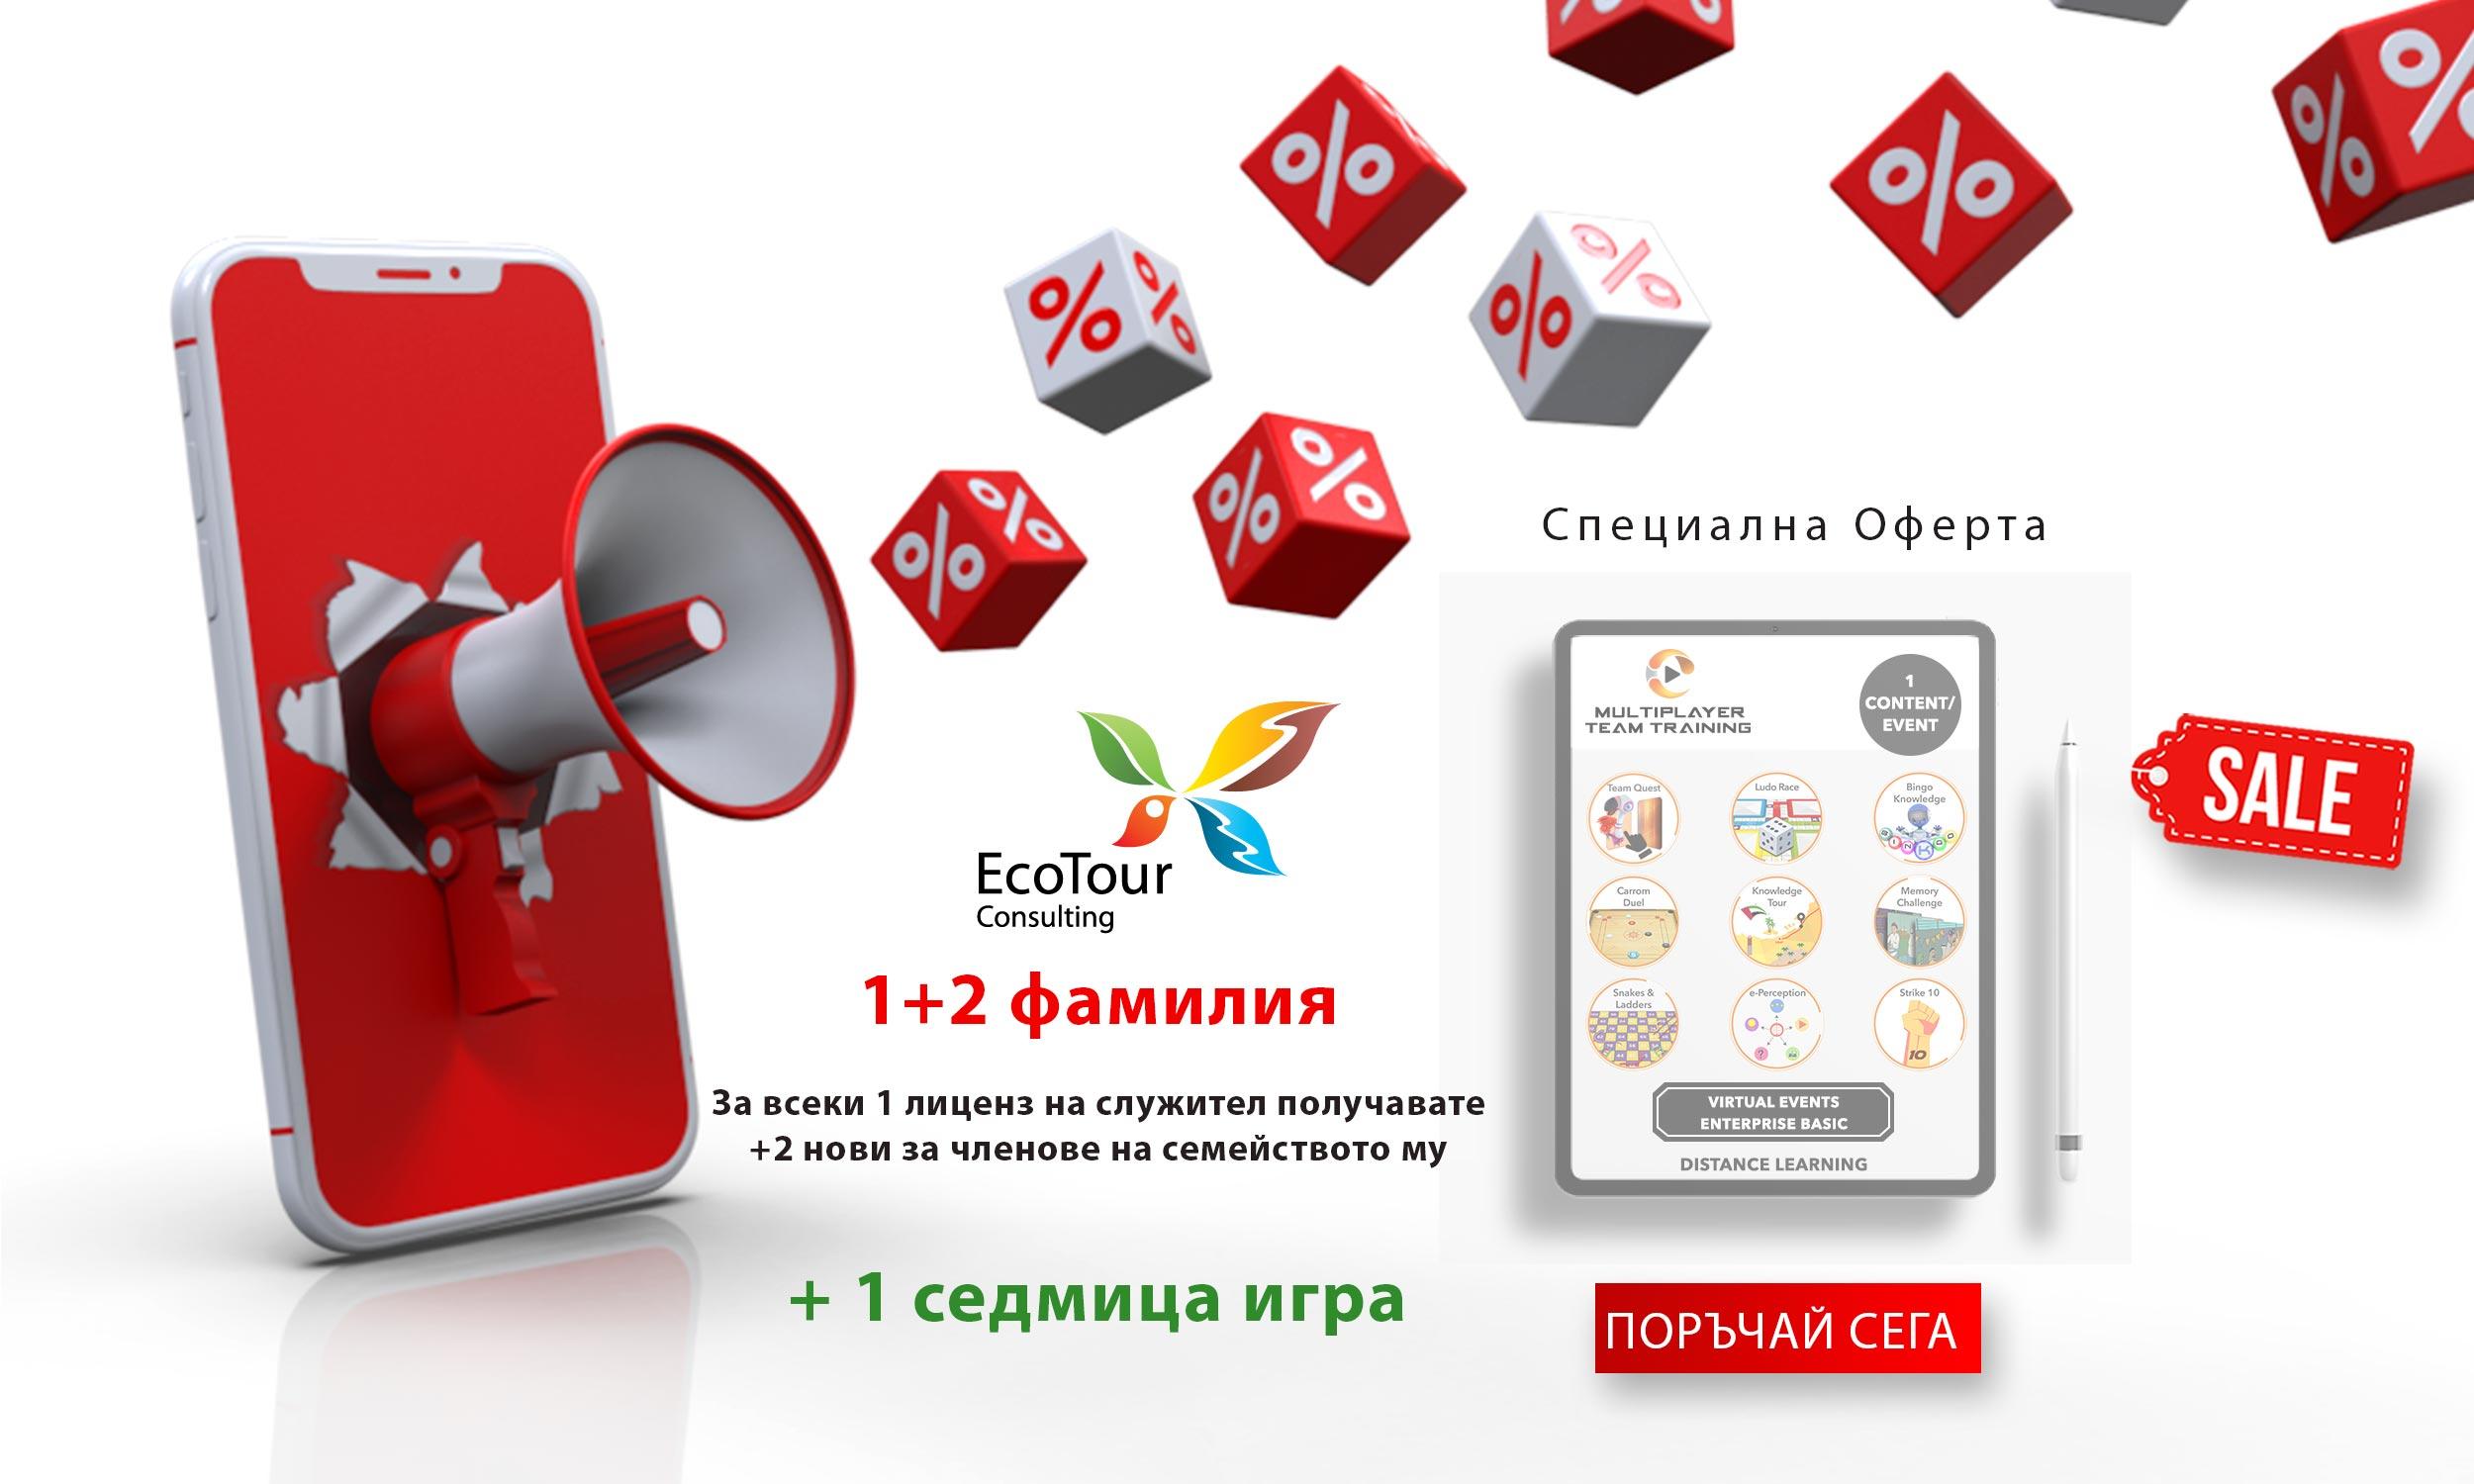 offer-team-building-bulgaria